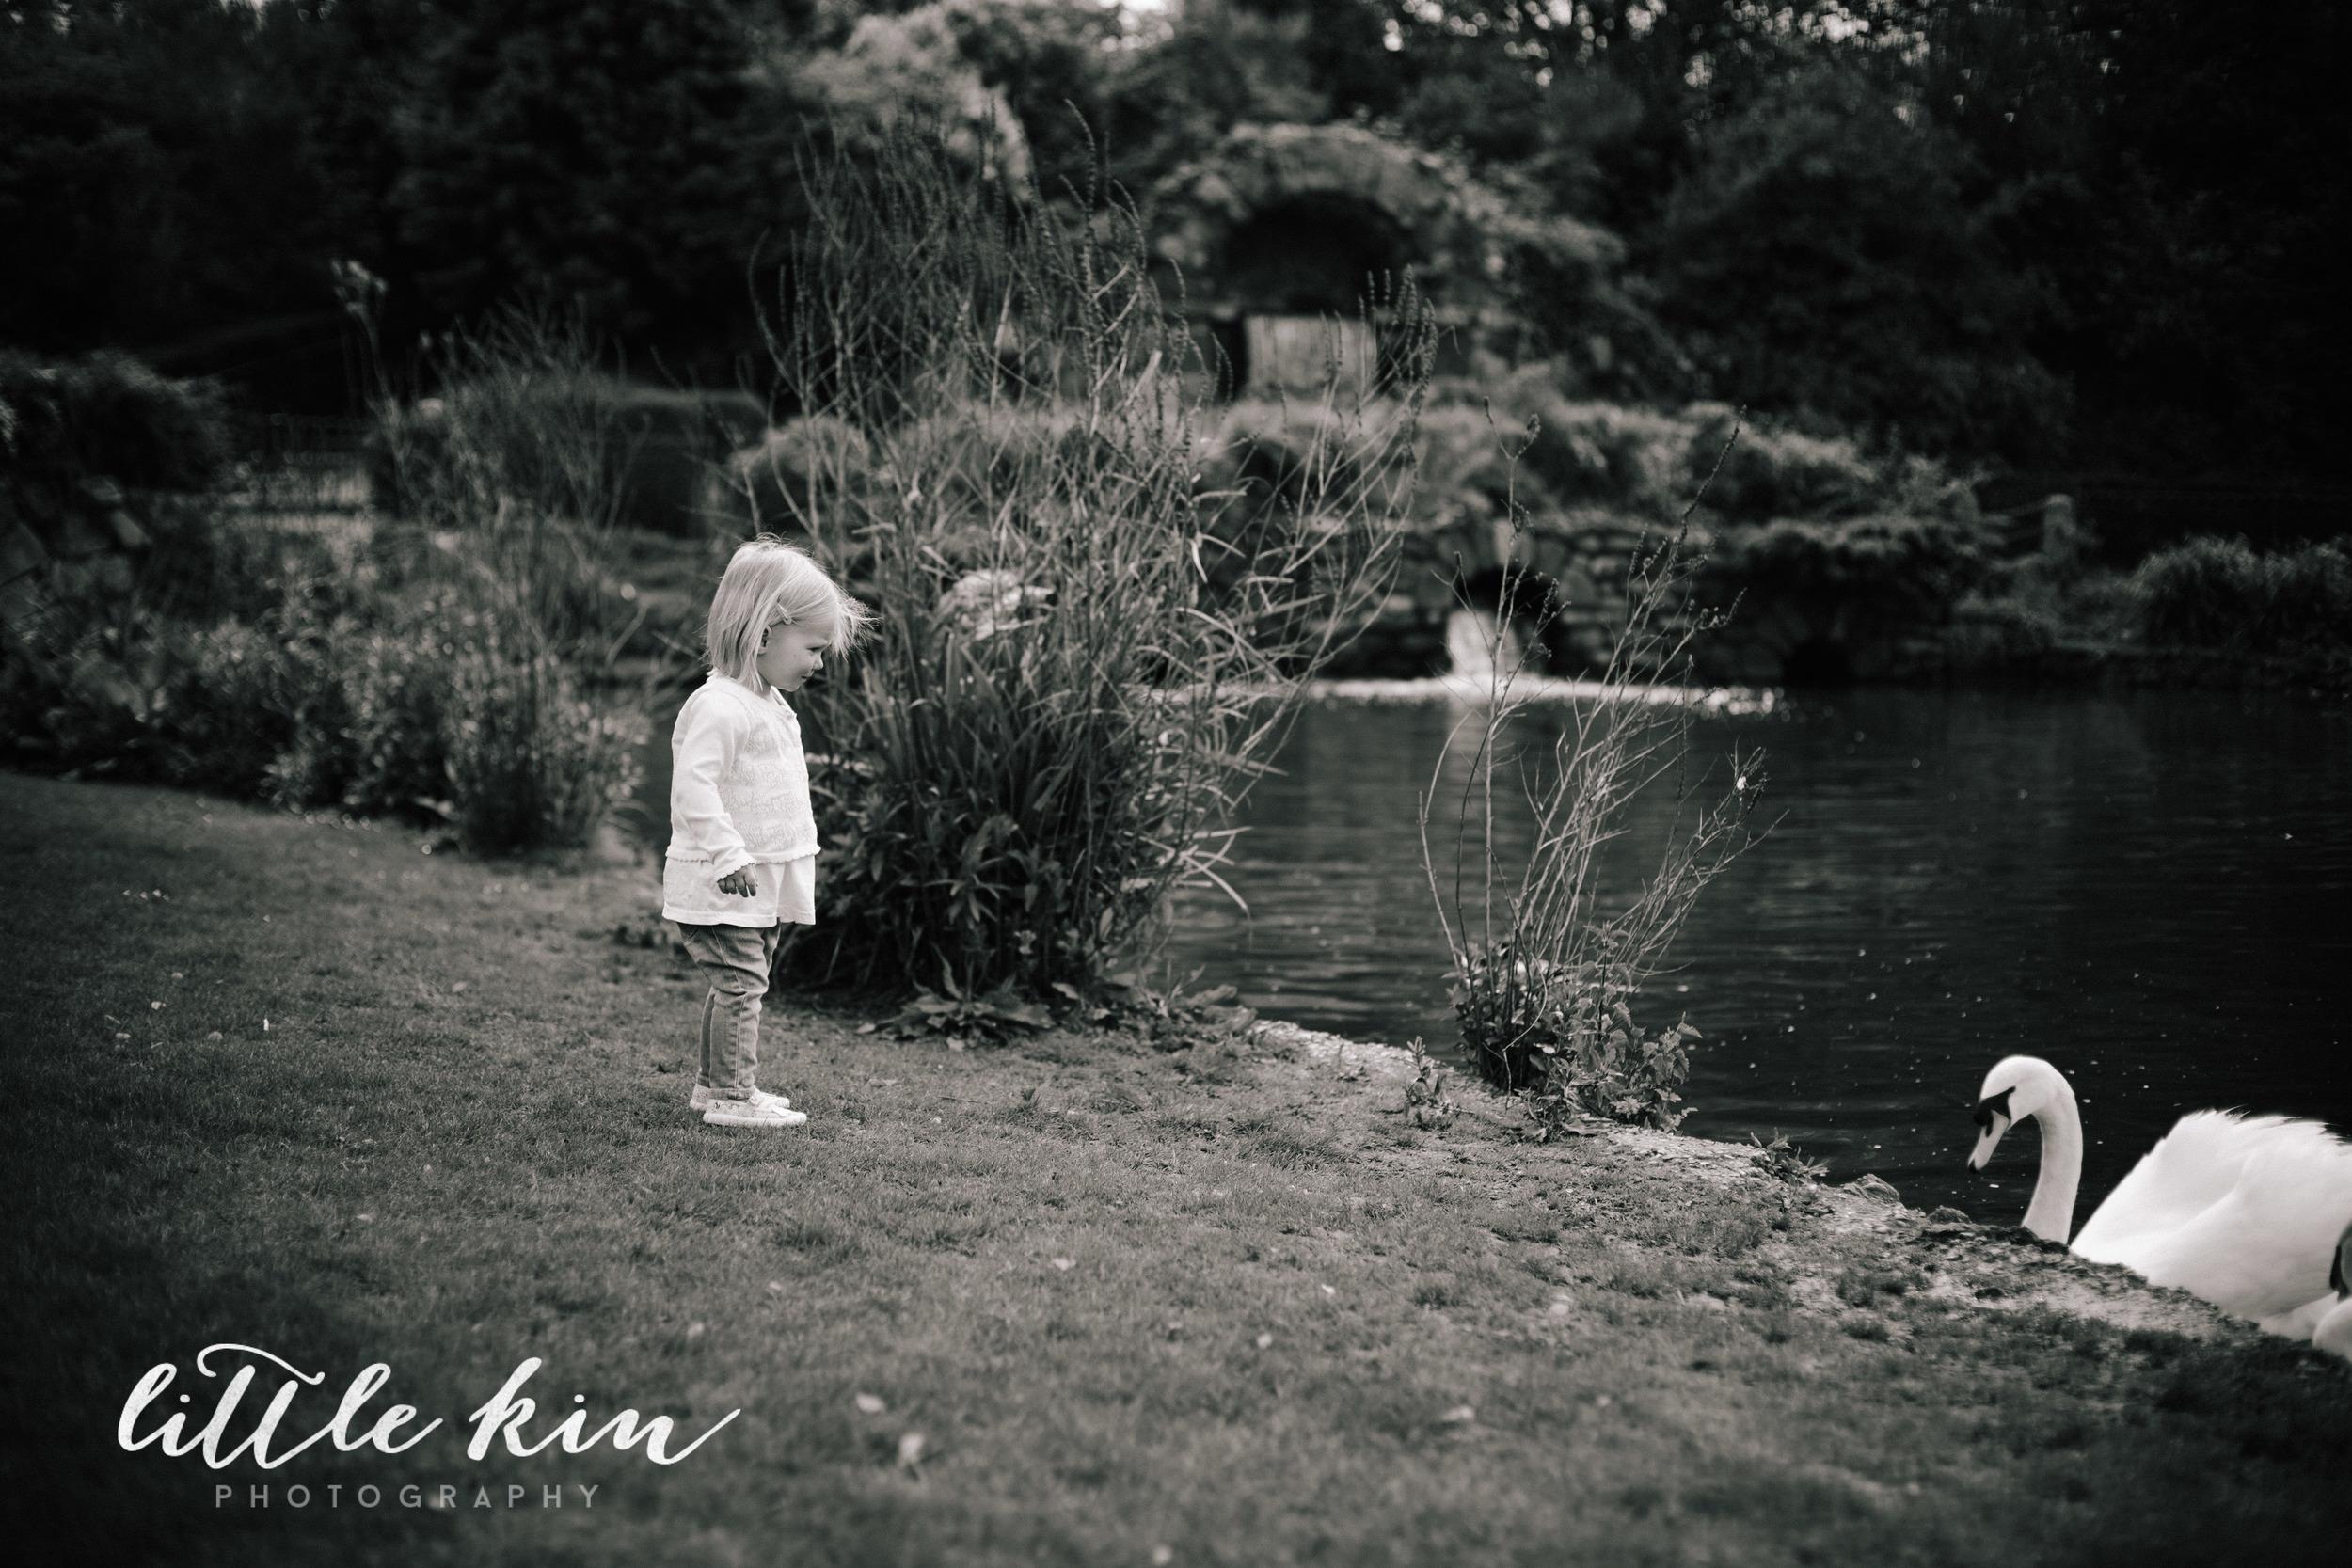 Amalia_LittleKinPhotography_media.jpg